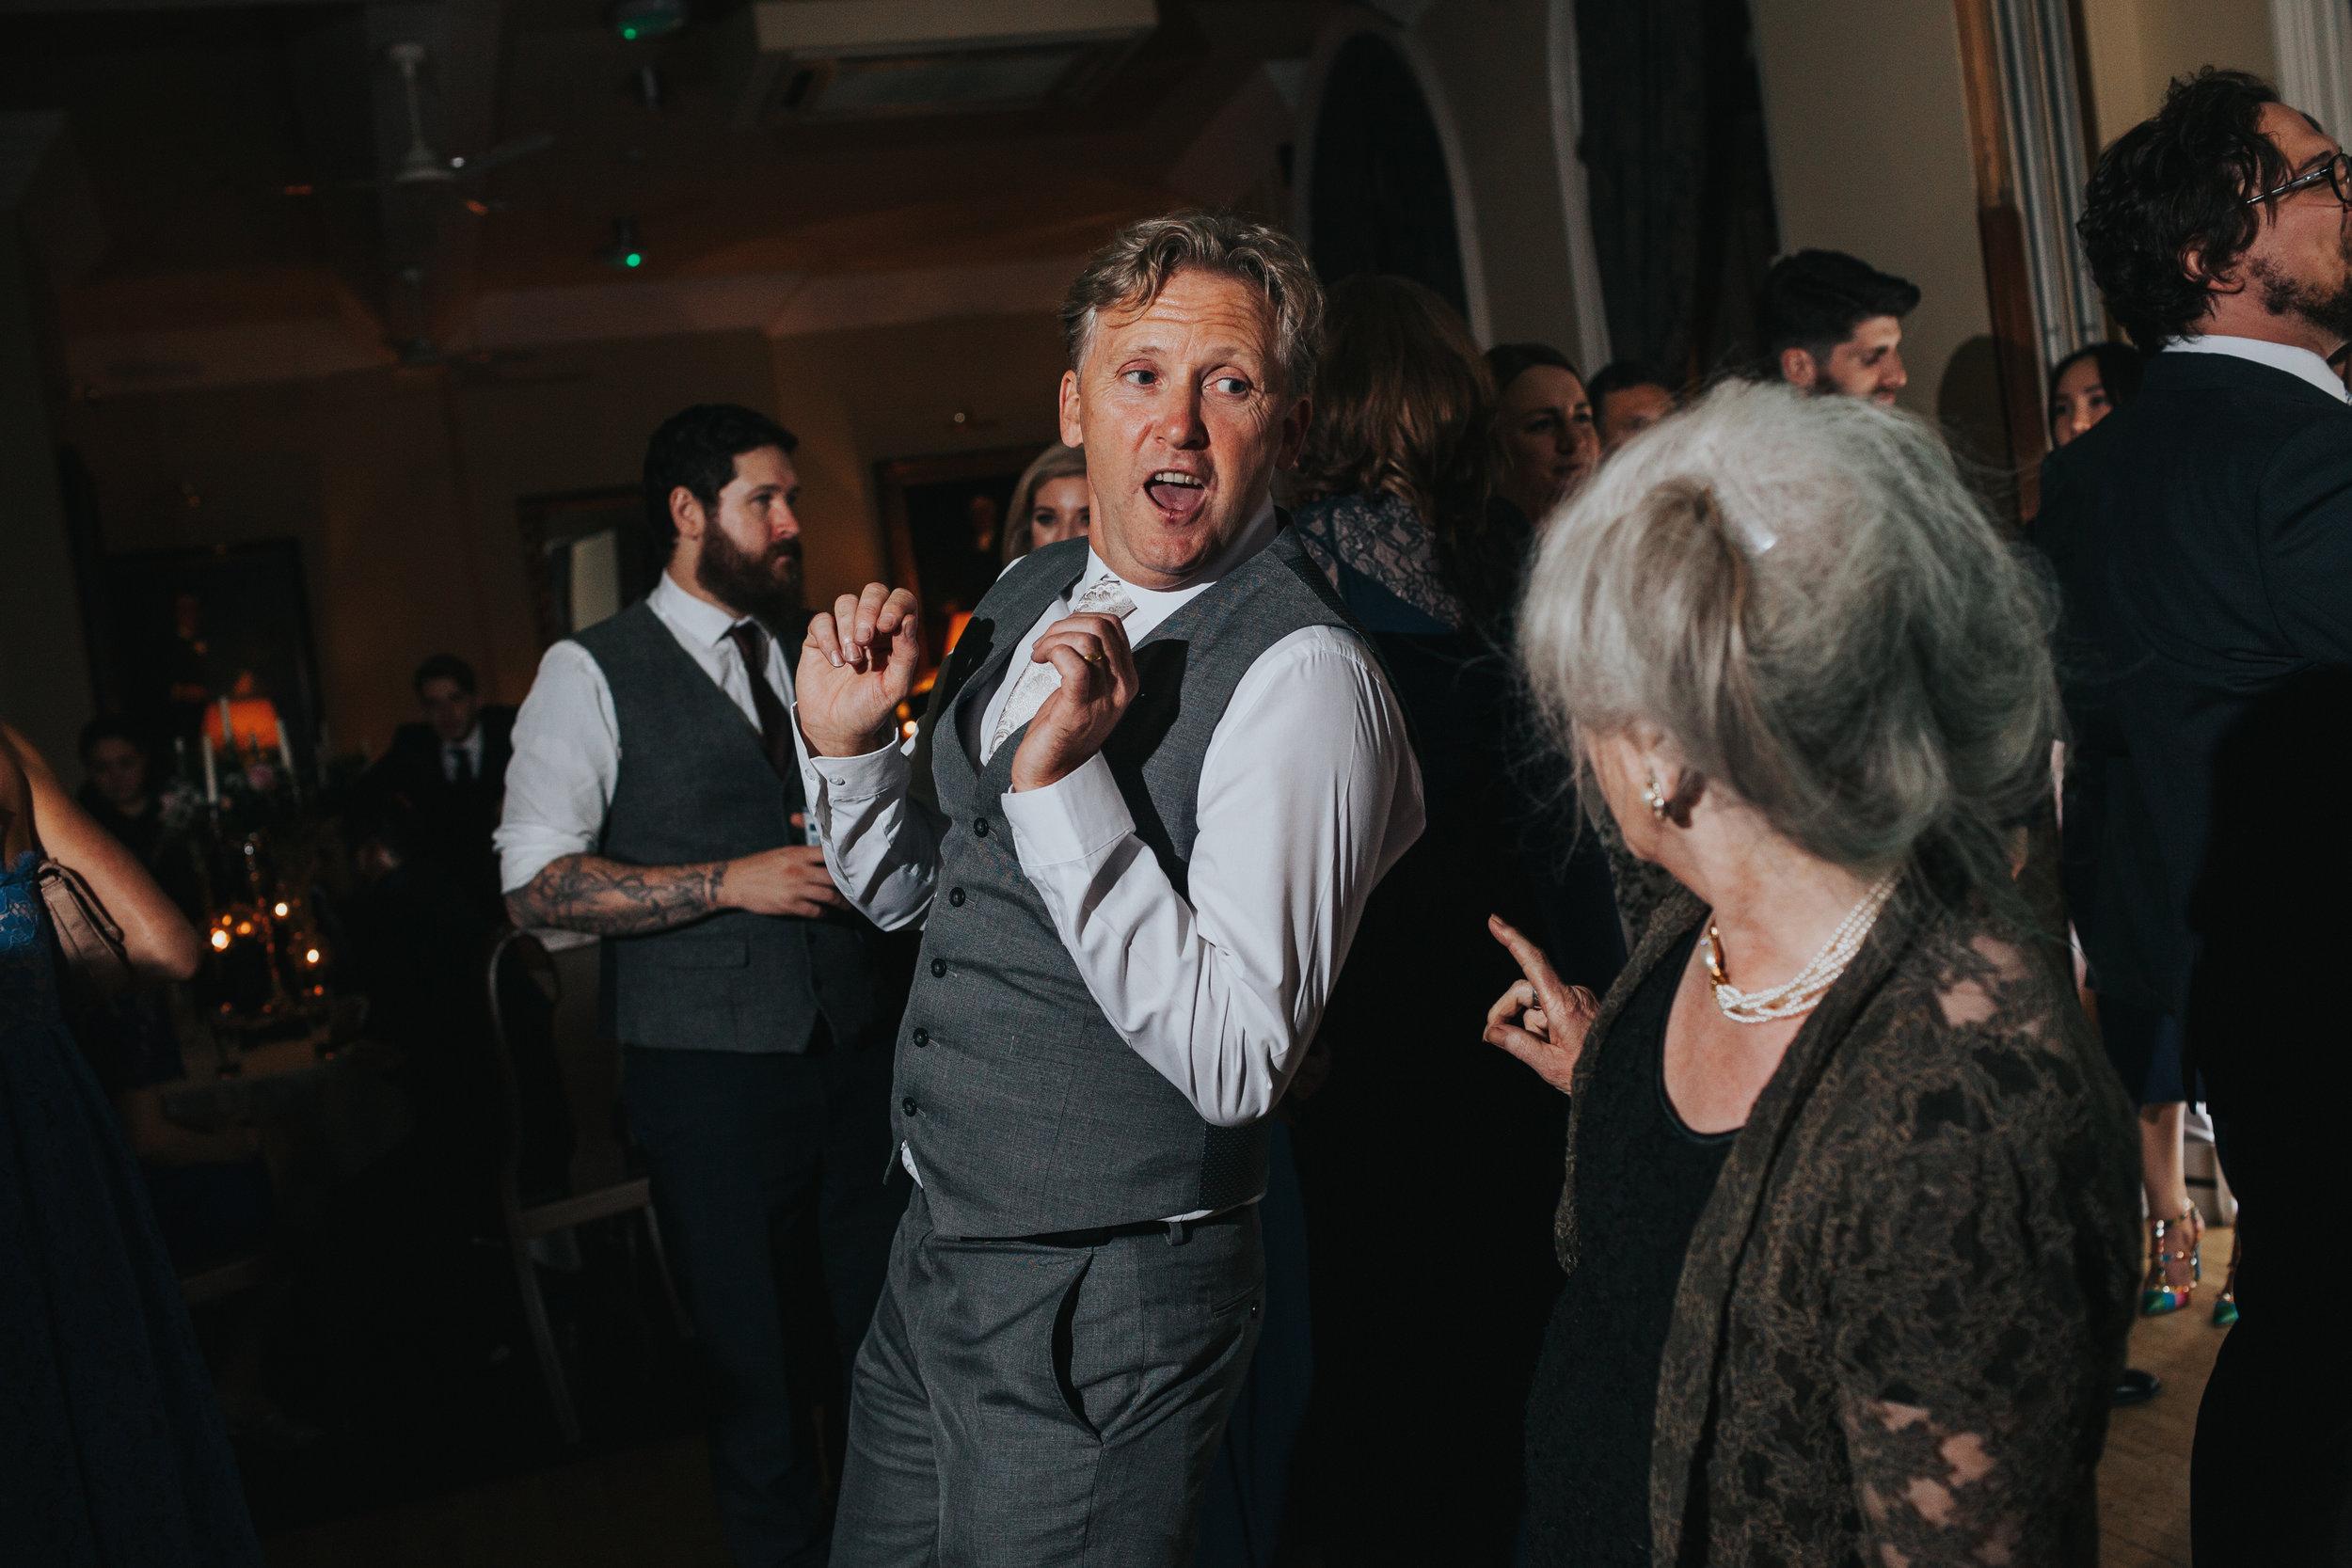 Wedding guest dancing, Racquet Club, Liverpool.